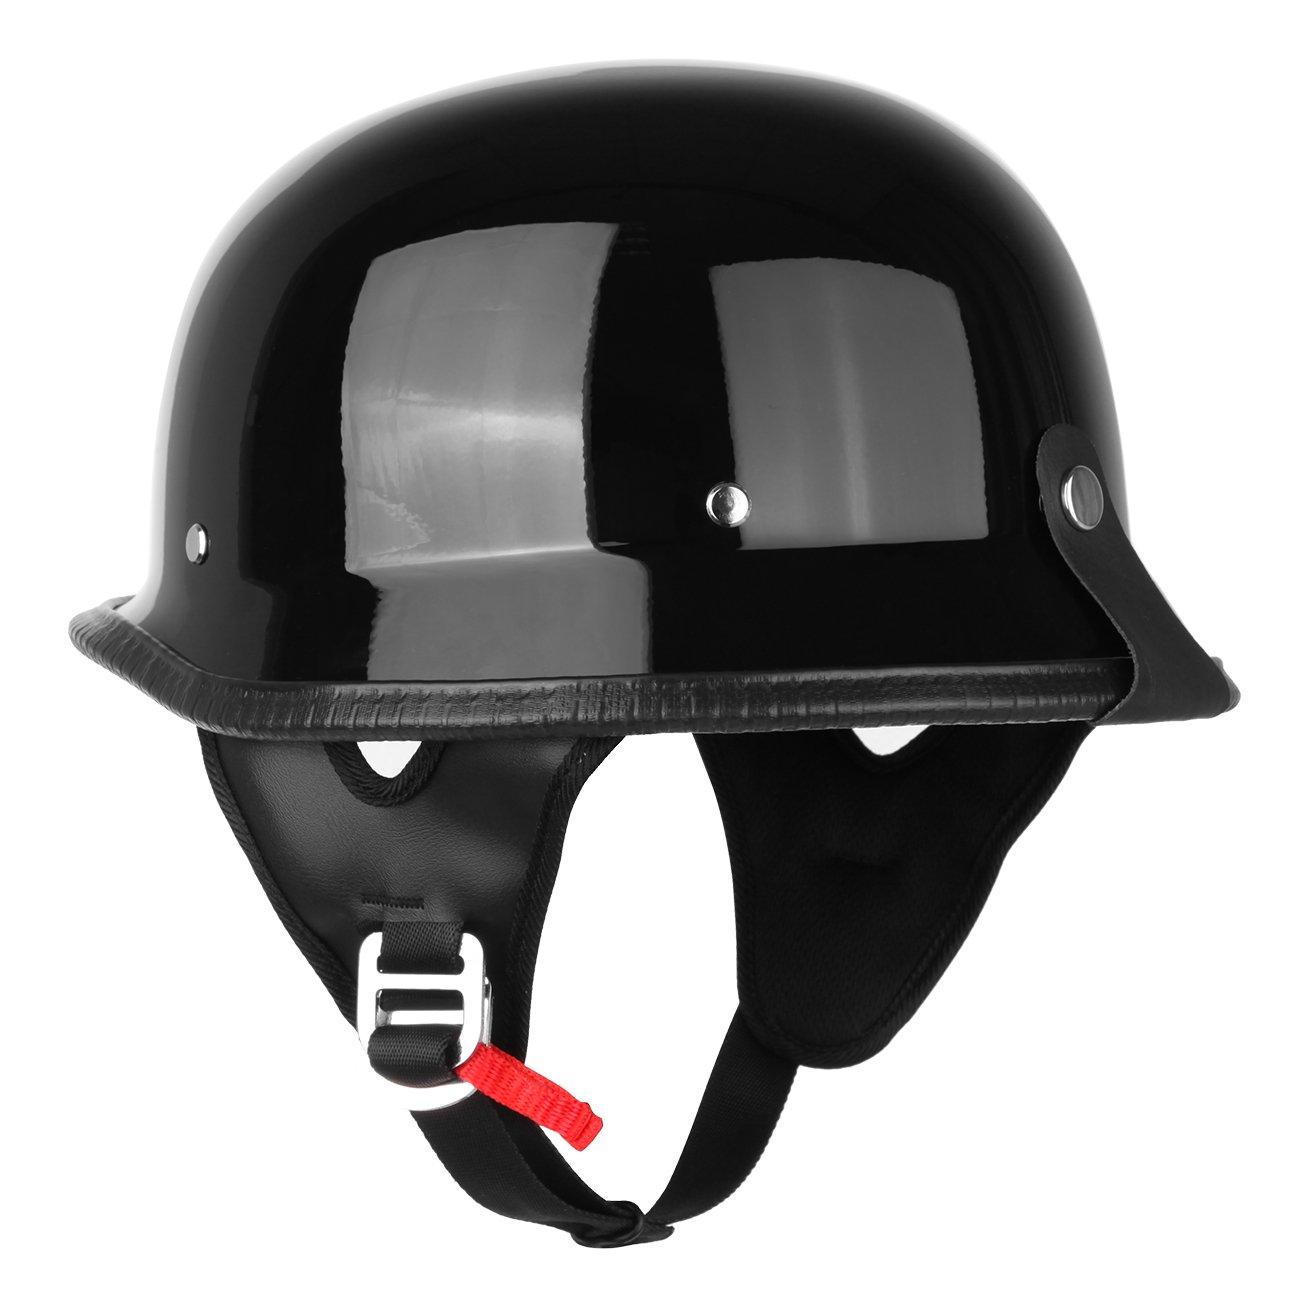 Amazon.com: Iglobalbuy DOT German Half Face Helmet Chopper Cruiser Biker Custom Airsoft Paitball Solid Glossy (M): Automotive